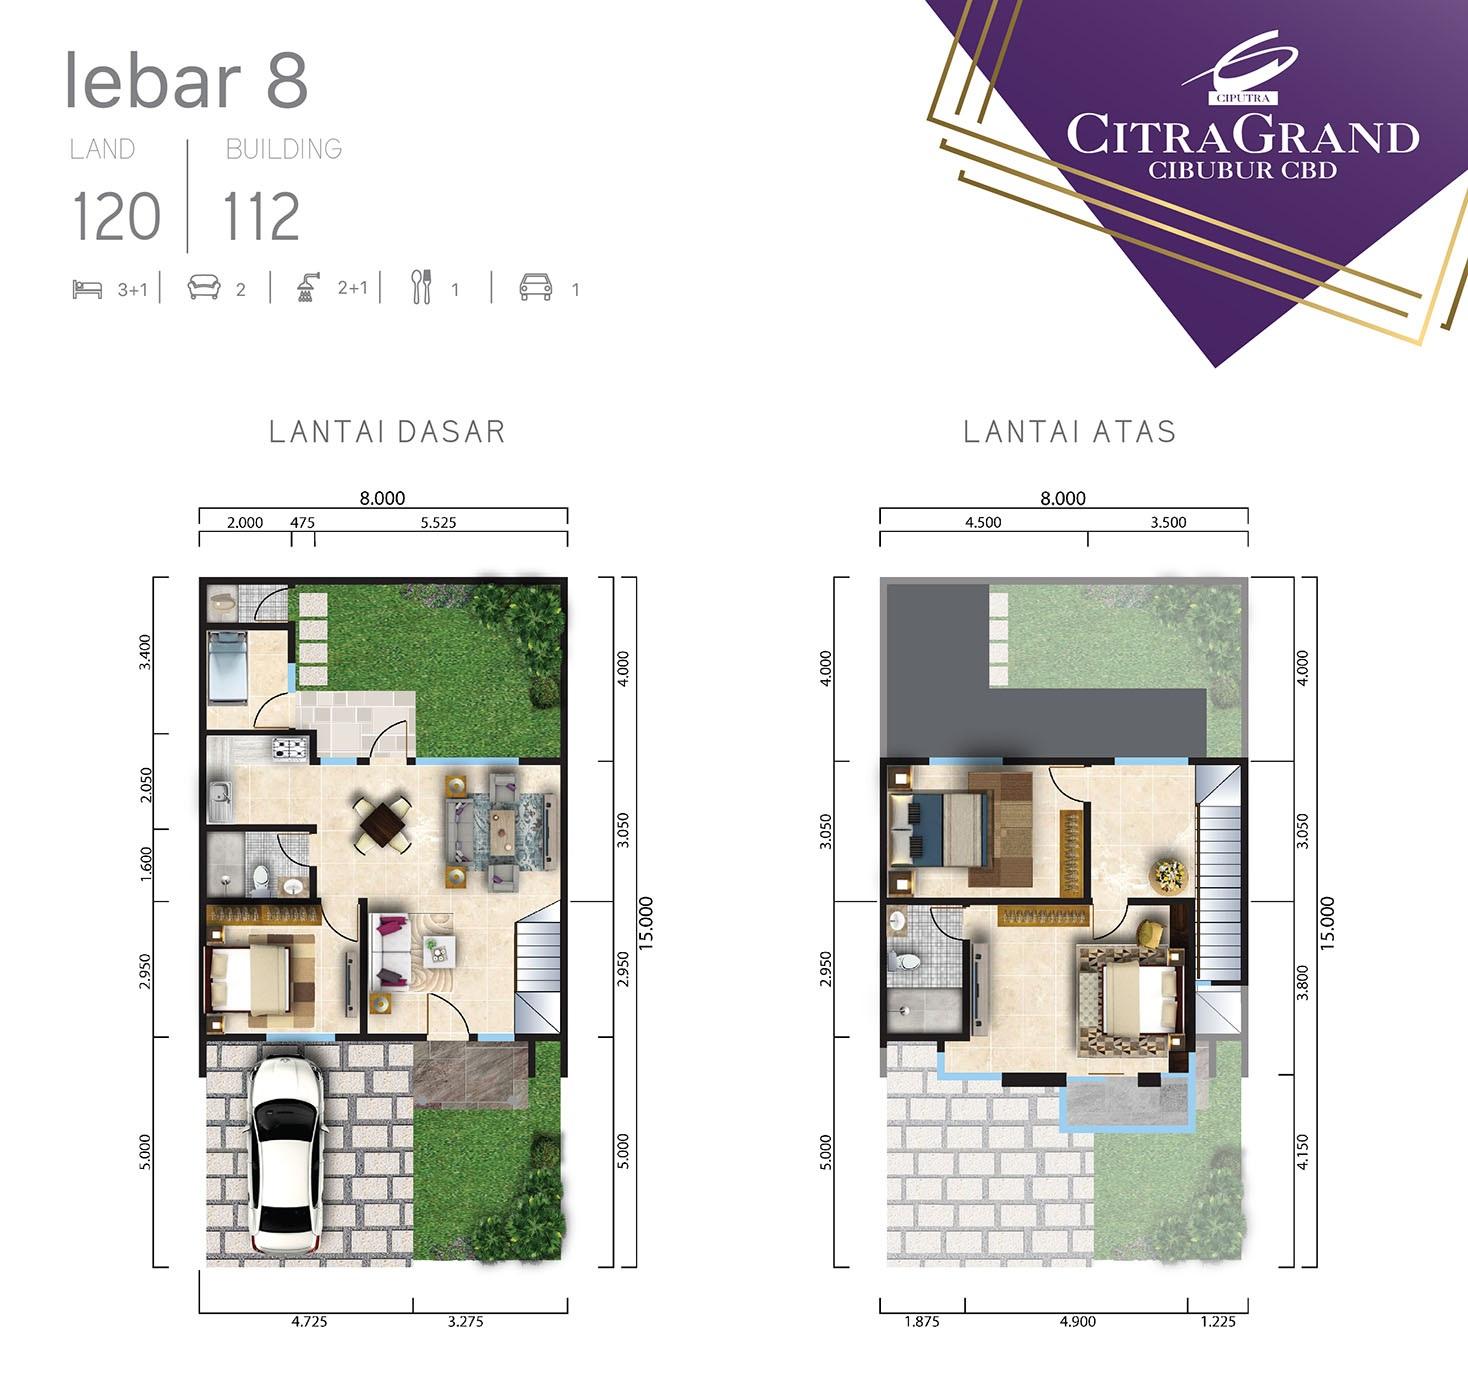 Perumahan-di-jakarta-timur-rumah-rumah-minimalis-rumah-dijual-property-citra-grand-cibubur-WEB-GRANBURY-7